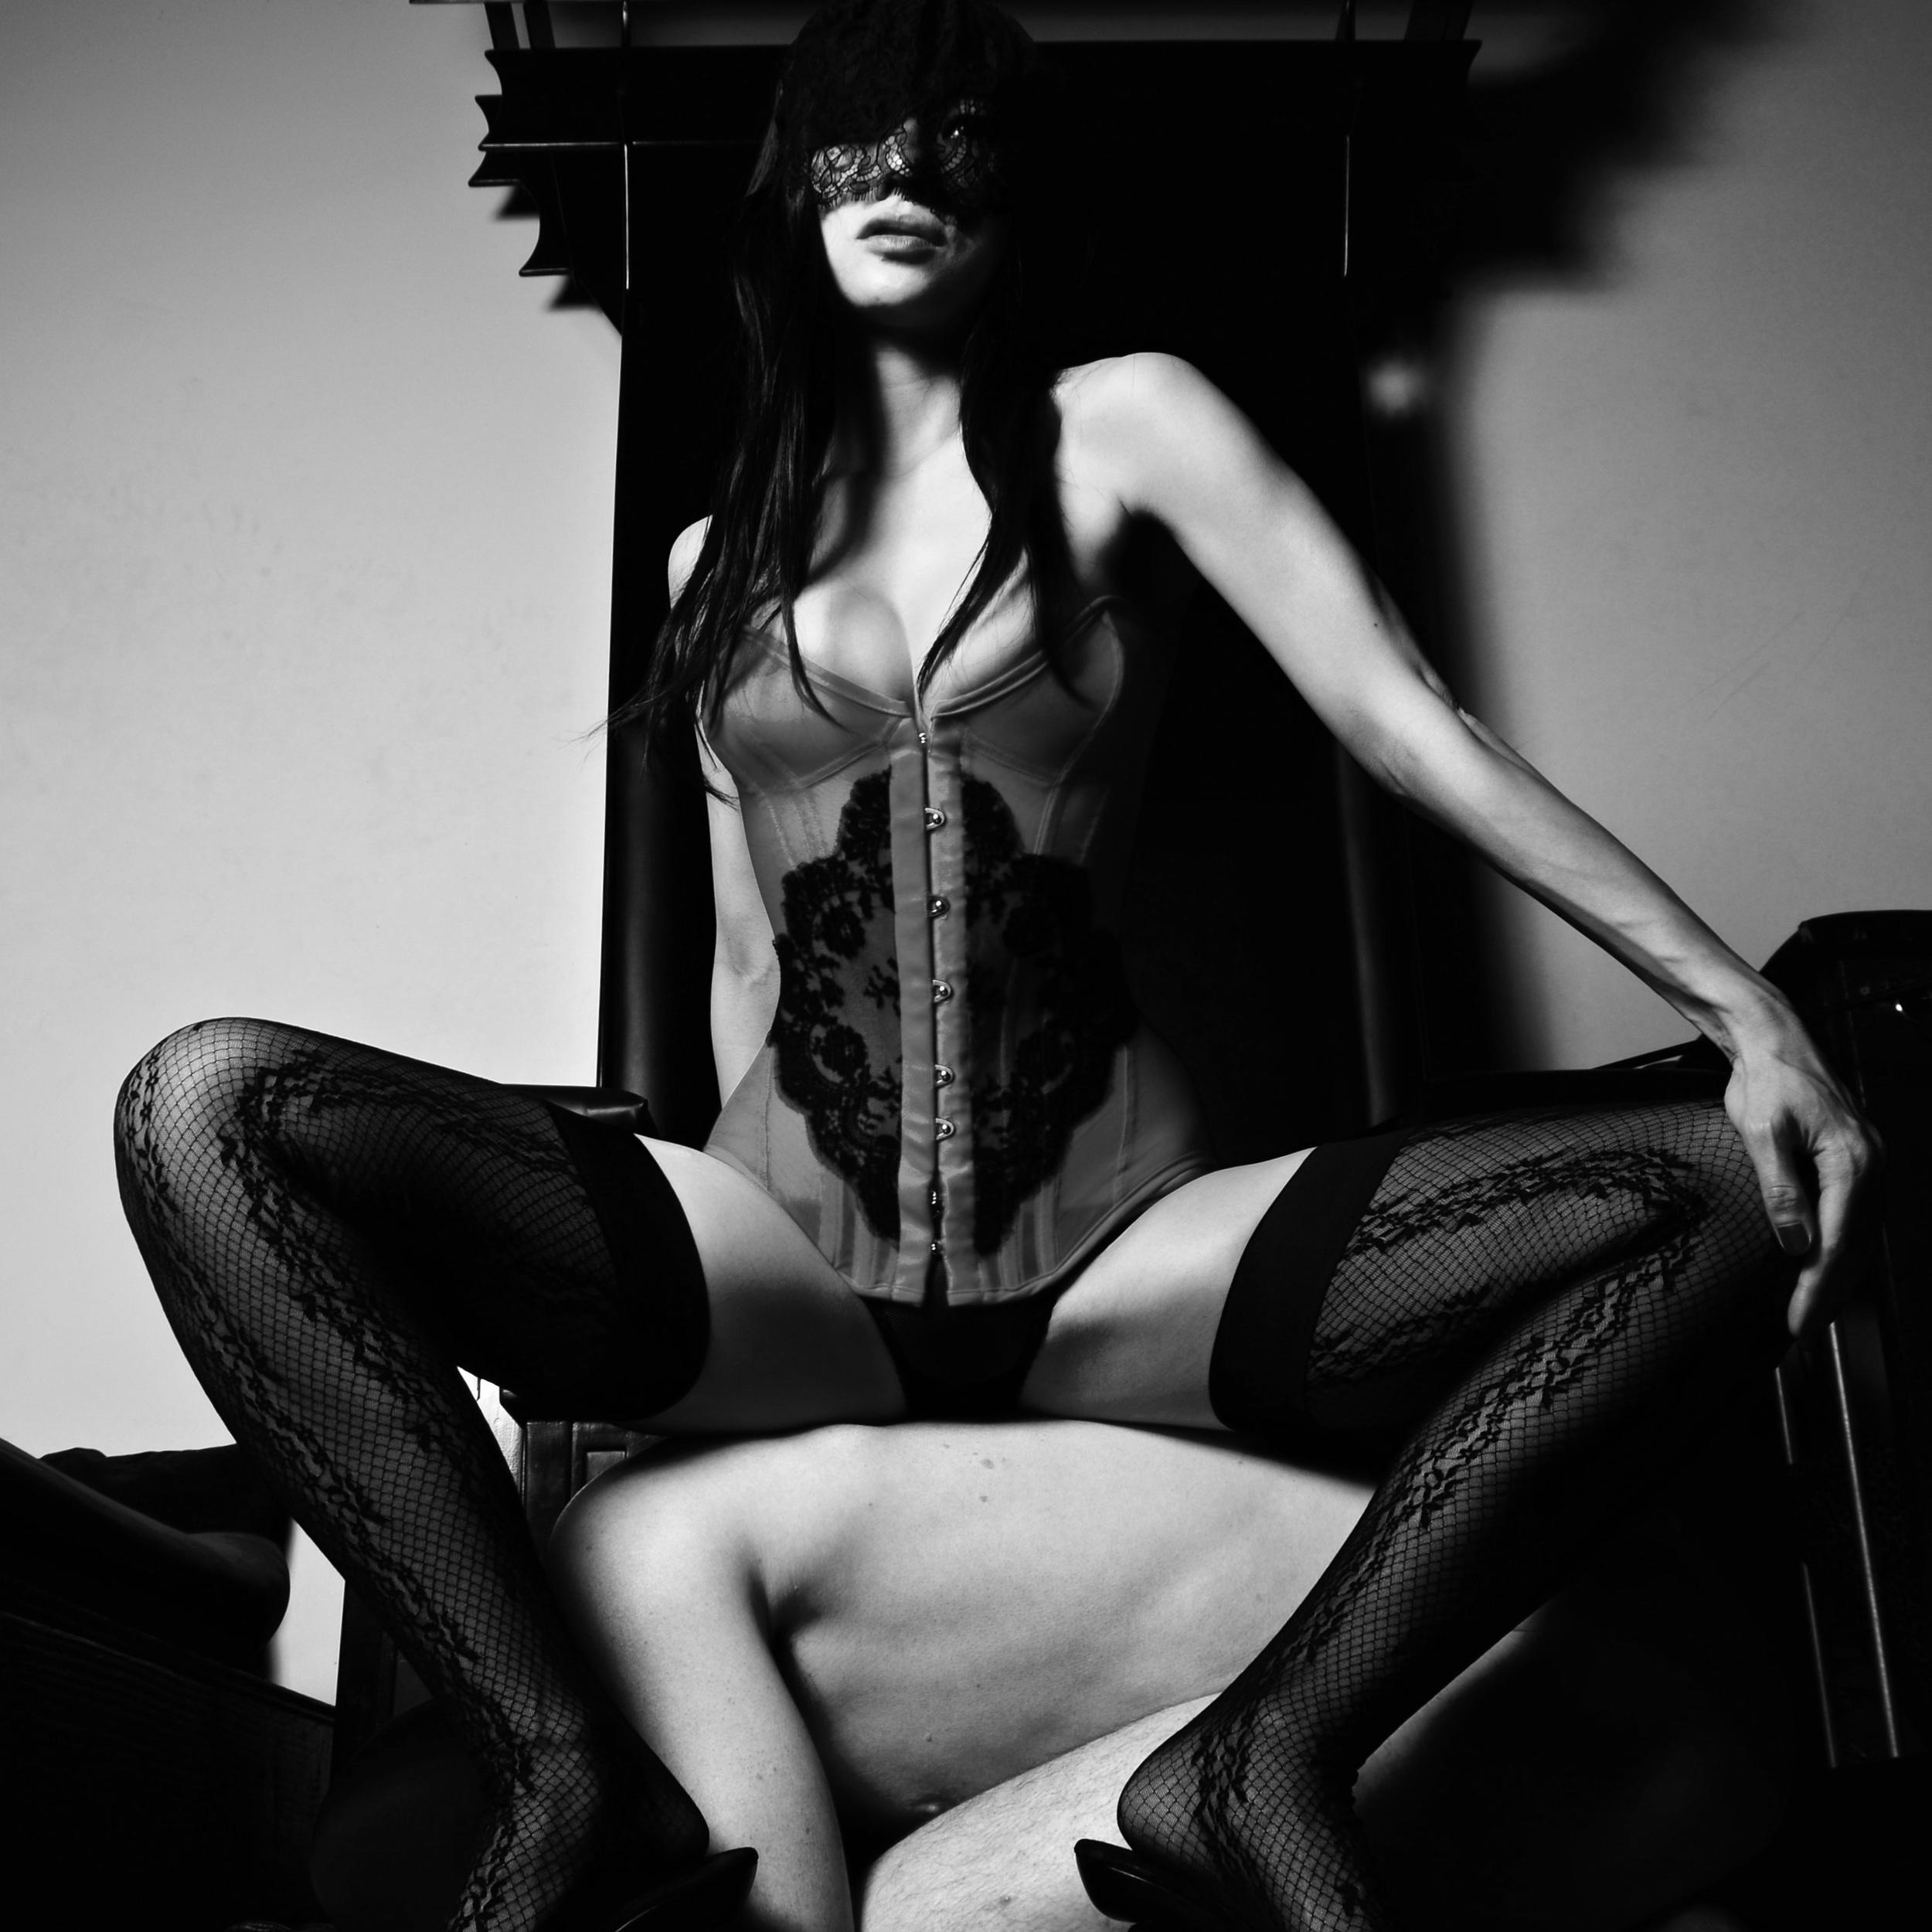 Mistress Collete, Dominatrix